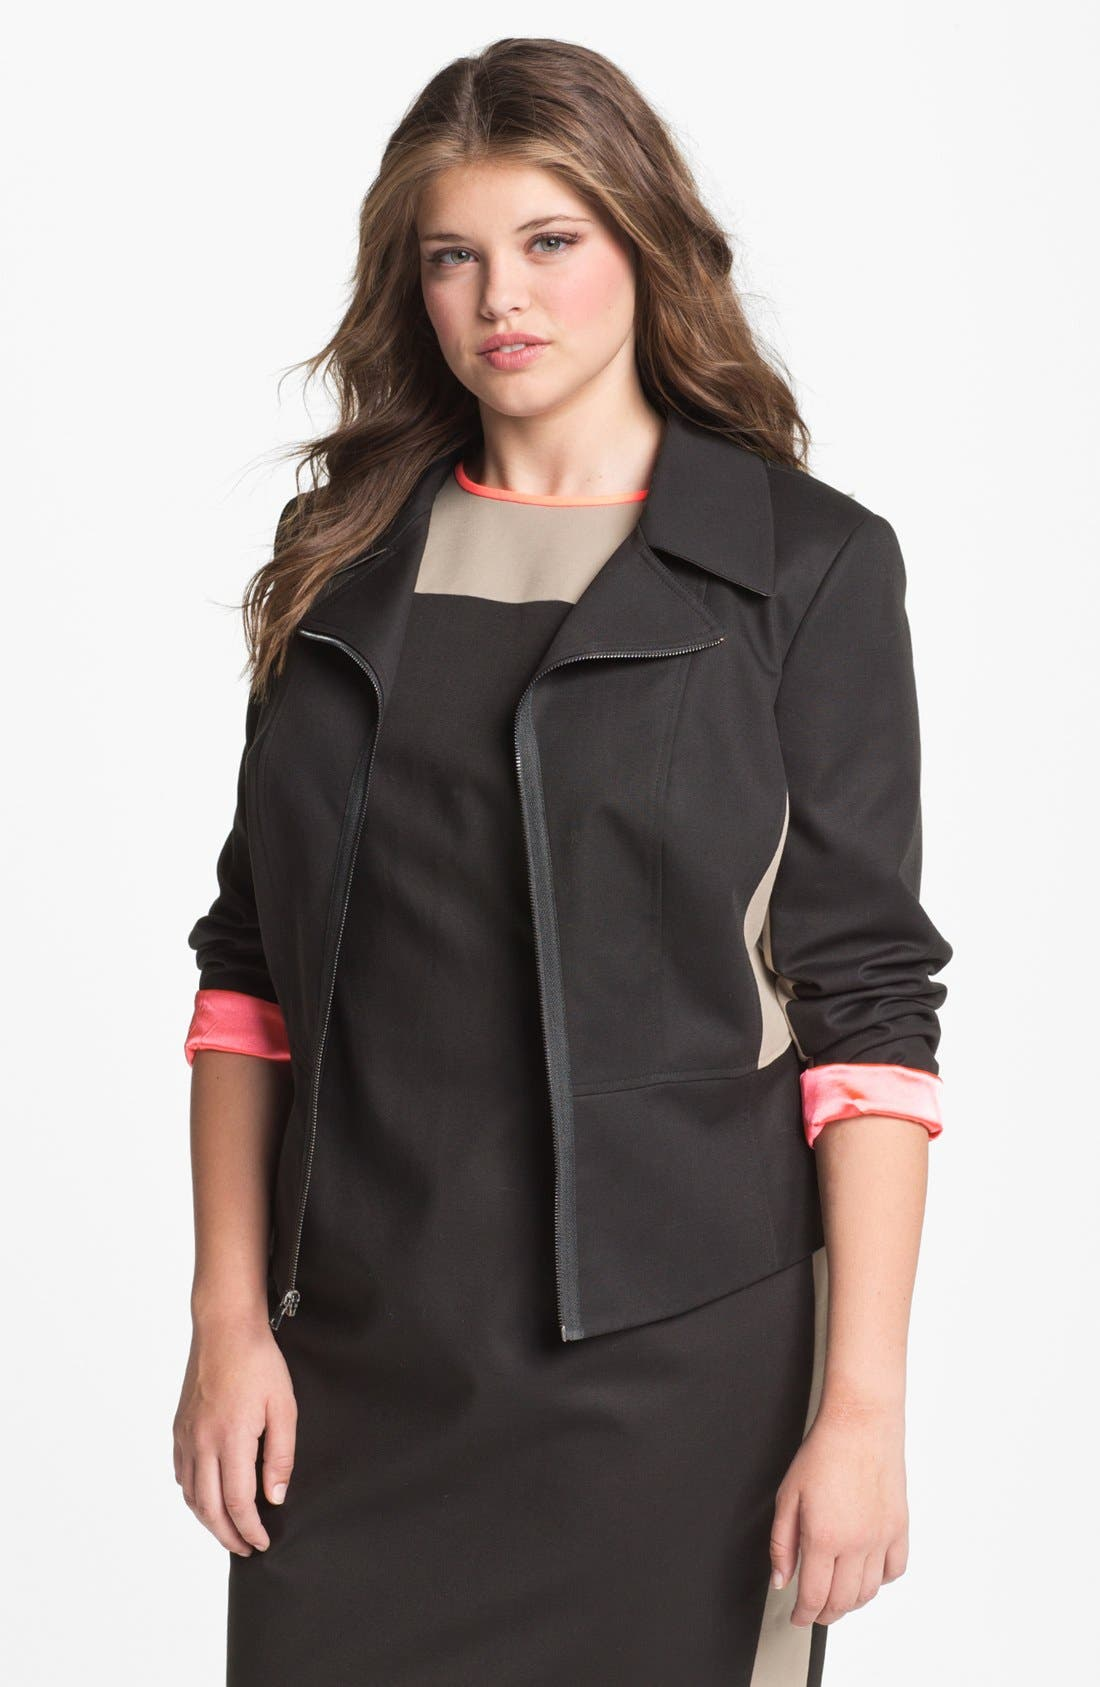 Alternate Image 1 Selected - Tahari Woman 'Althea' Colorblock Peplum Jacket (Plus)